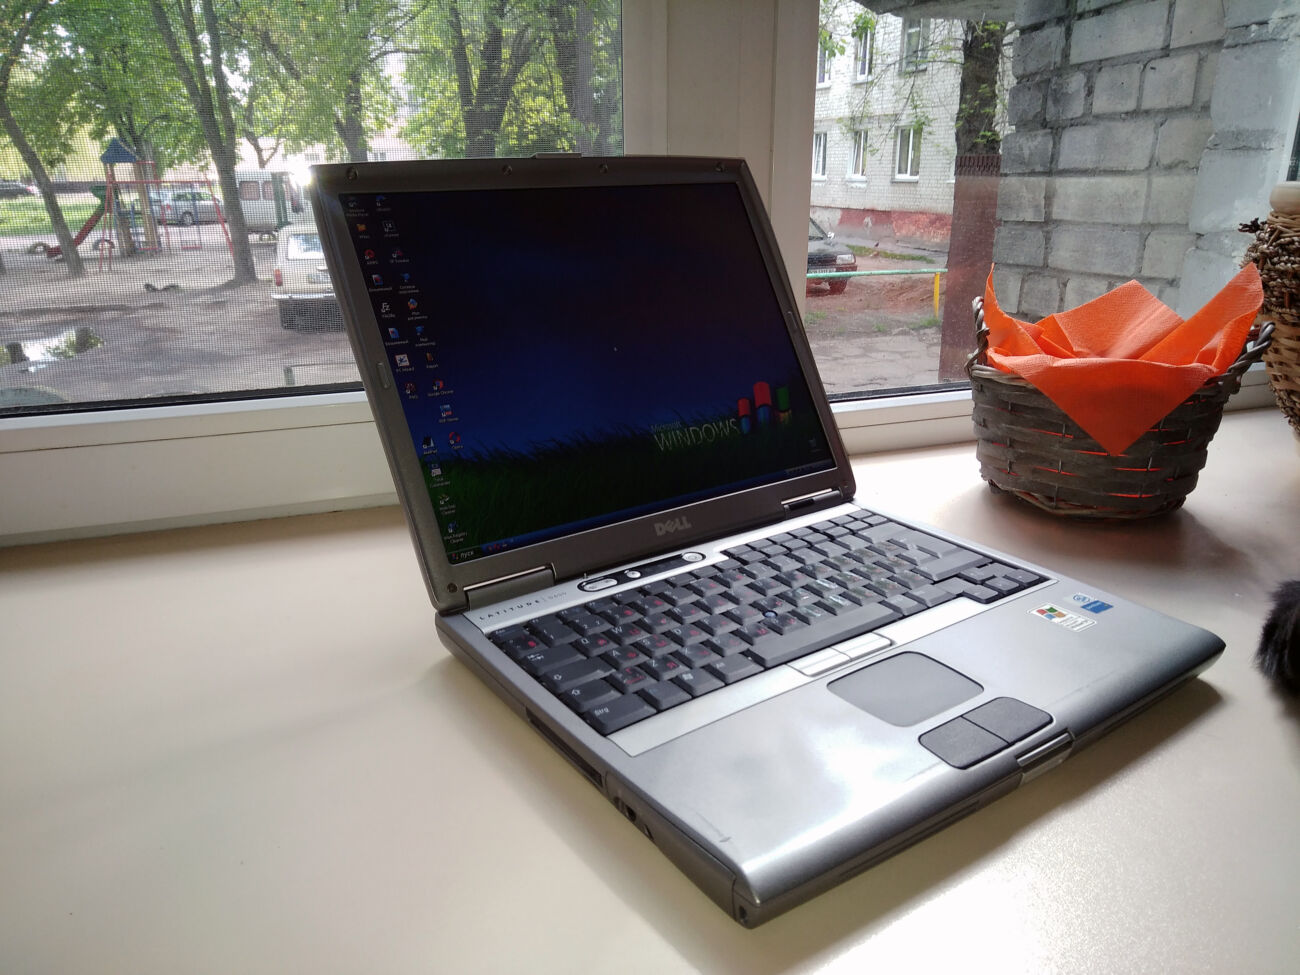 Ноутбук Dell Latitude D600 (Intel/RAM 2Gb/HDD 120Gb/АКБ 3.5ч) COM-порт